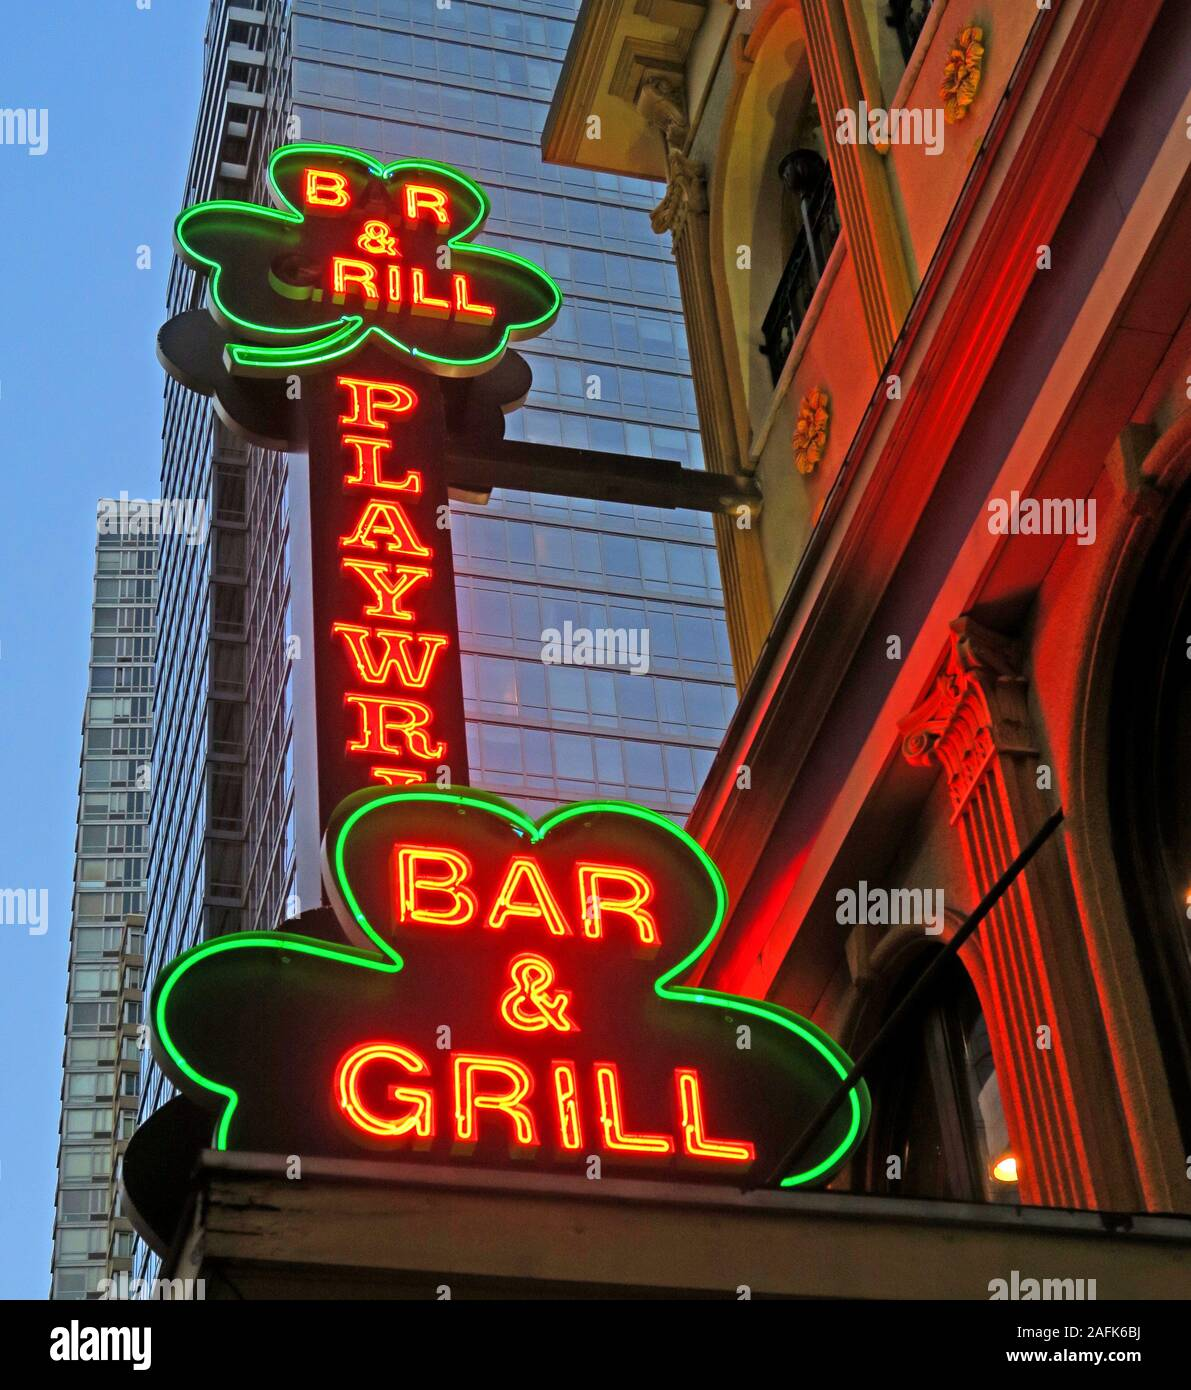 HotpixUK,@HotpixUk,GoTonySmith,NYC,NY,New York,Manhattan,USA,city,city centre,US,grill,lucky,Irish bar & Grill,Irish bar,Ireland,Shamrock,playwright bar grill new york,playwright bar grill,playwright Irish Bar,sign,neon sign